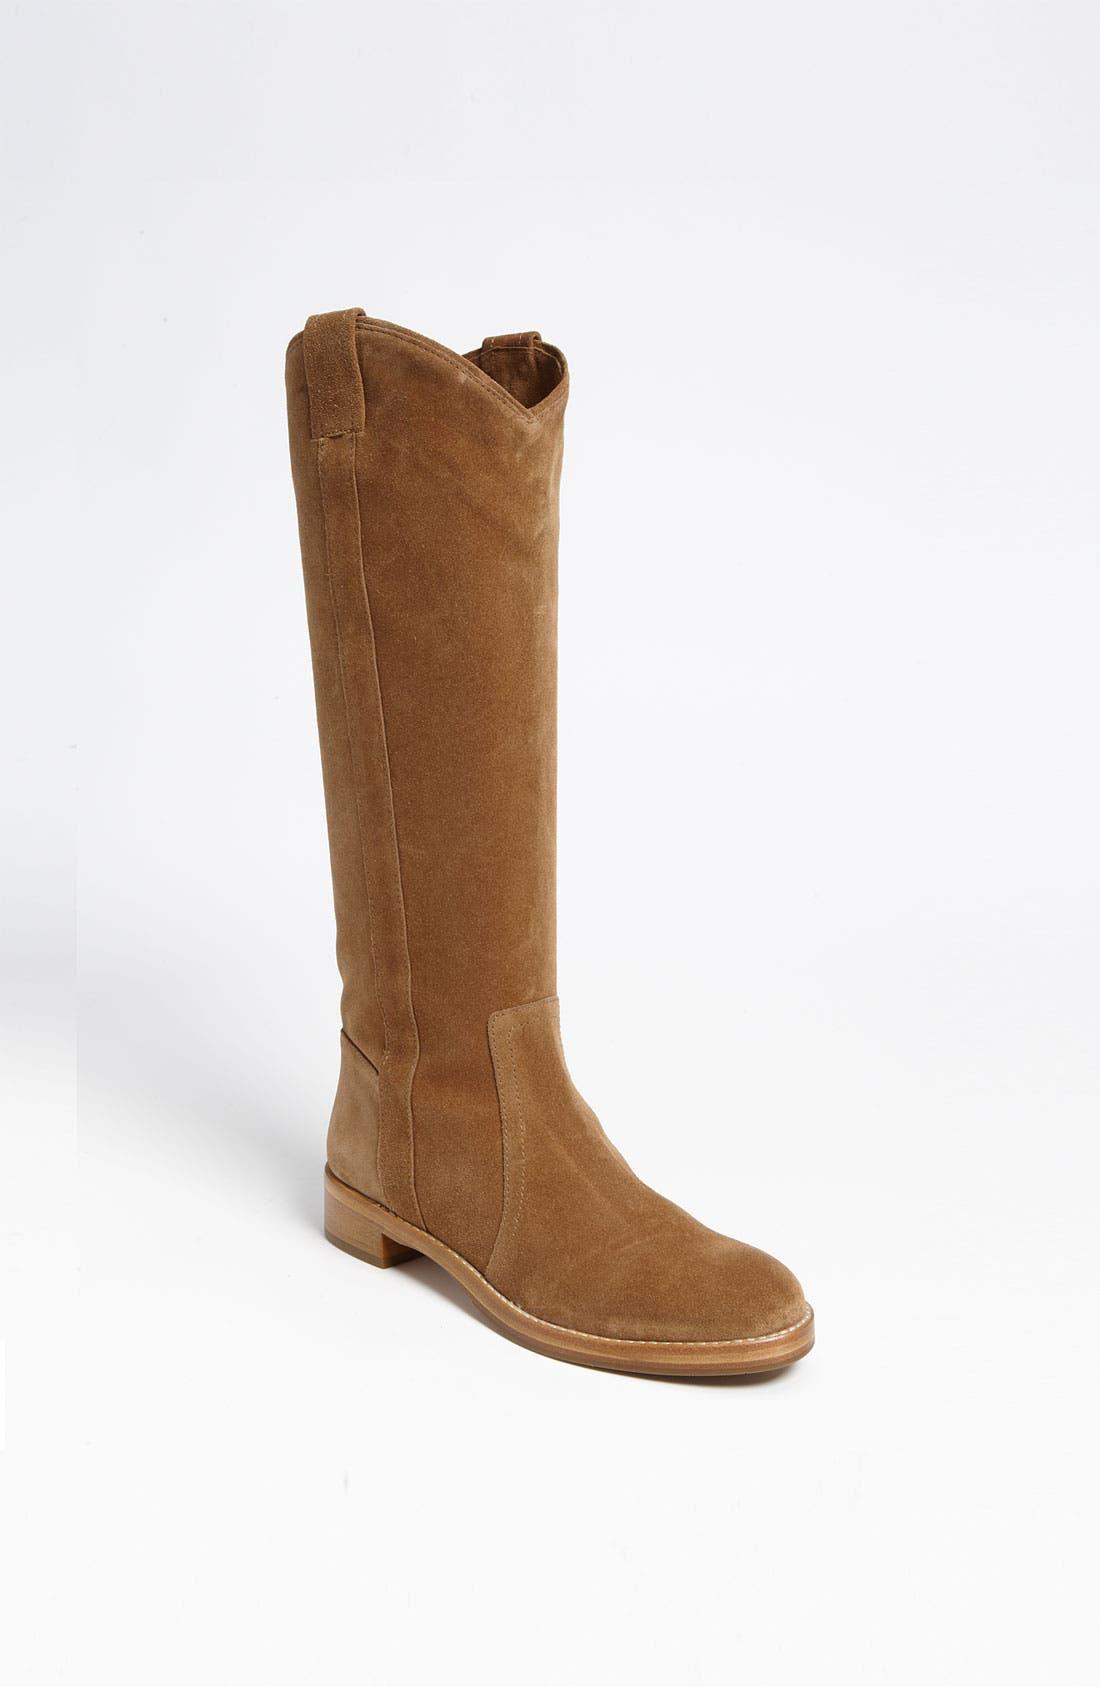 Alternate Image 1 Selected - Via Spiga 'Gillian' Boot (Nordstrom Exclusive)